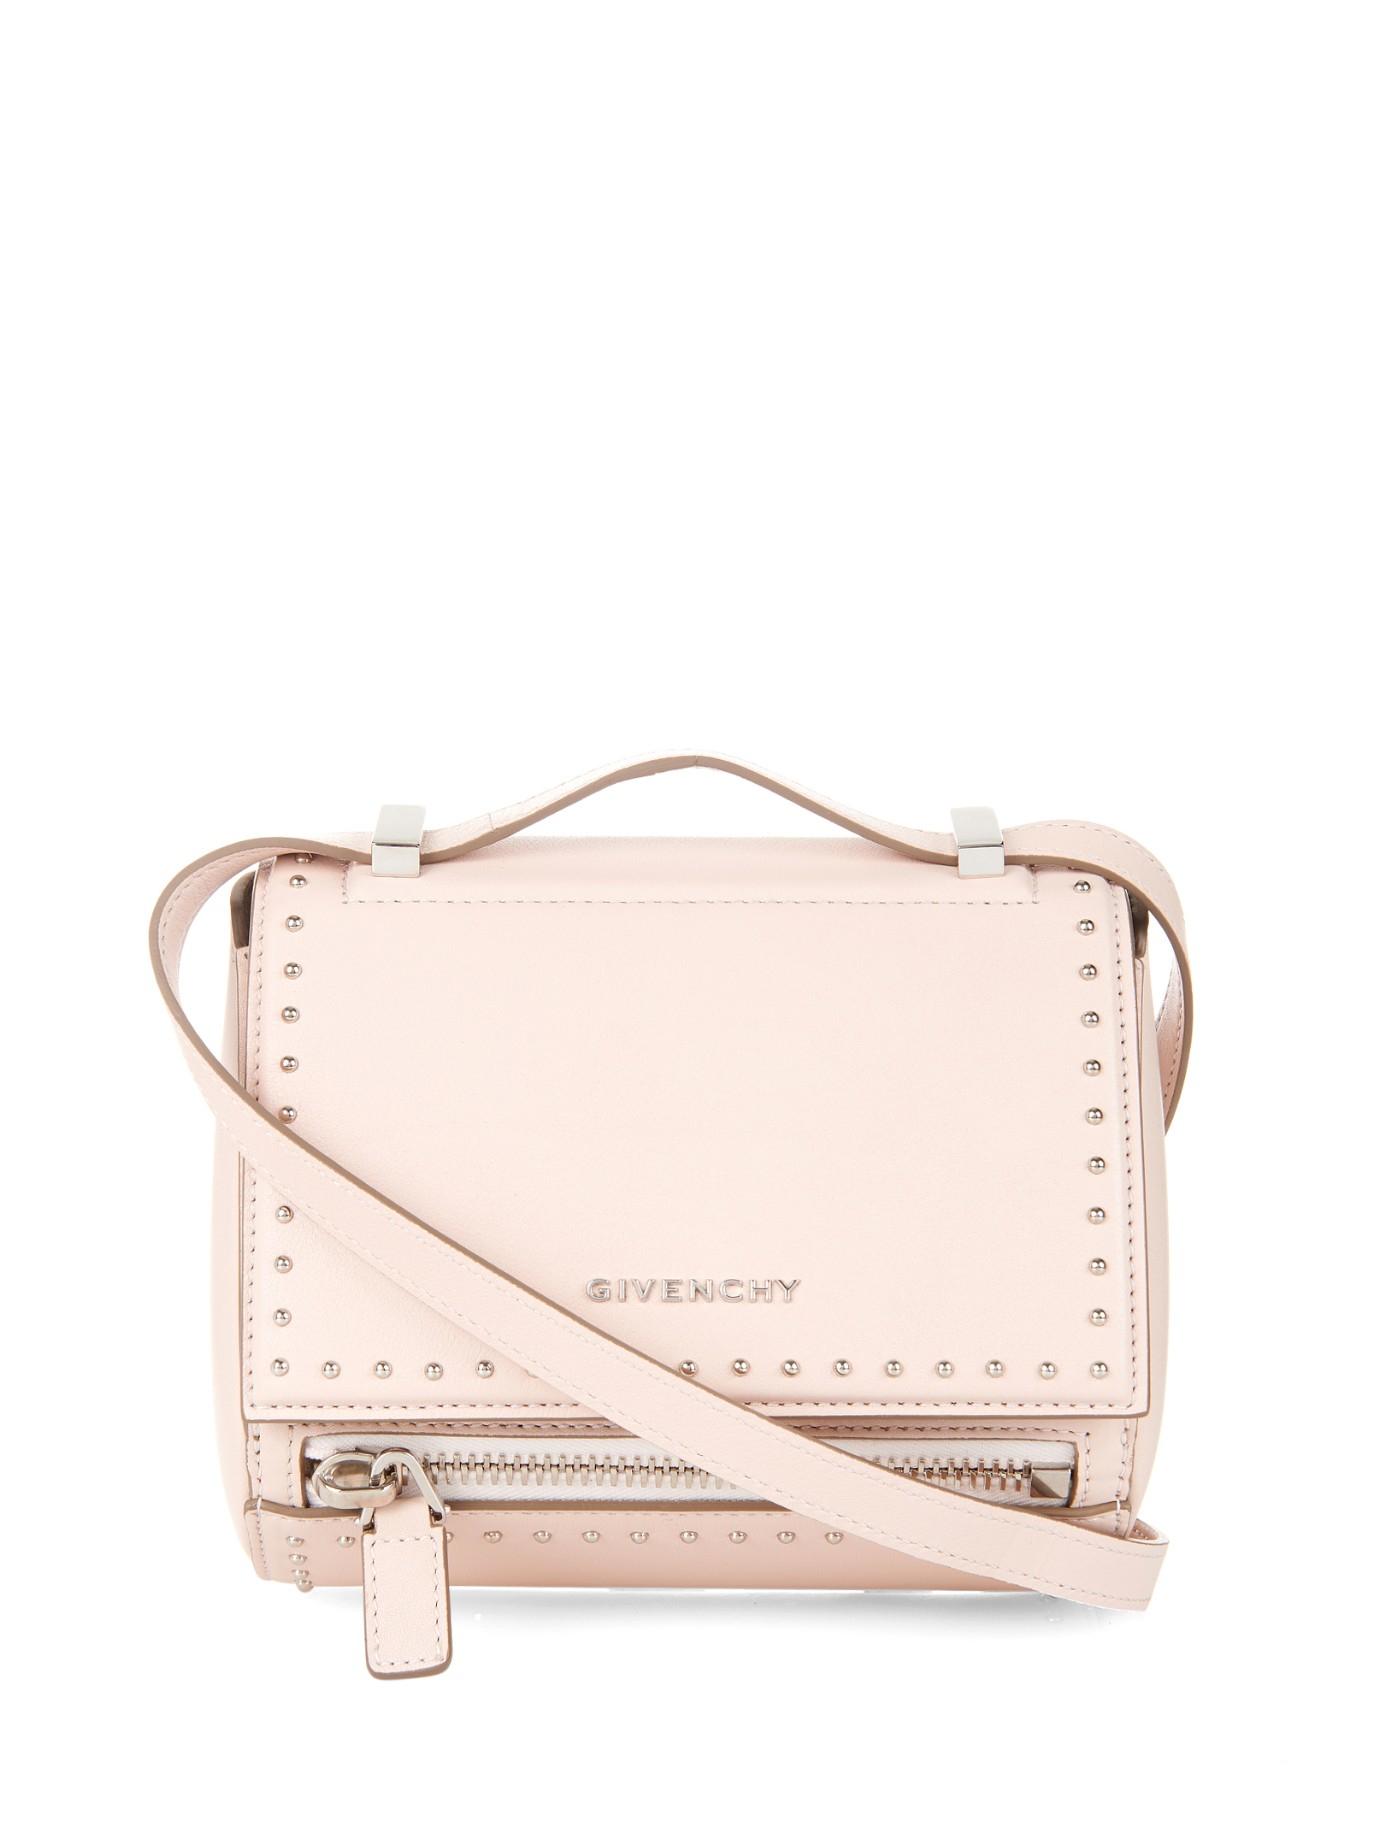 6b2a41eda3 Gallery. Previously sold at: MATCHESFASHION.COM · Women's Box Bags Women's Givenchy  Pandora